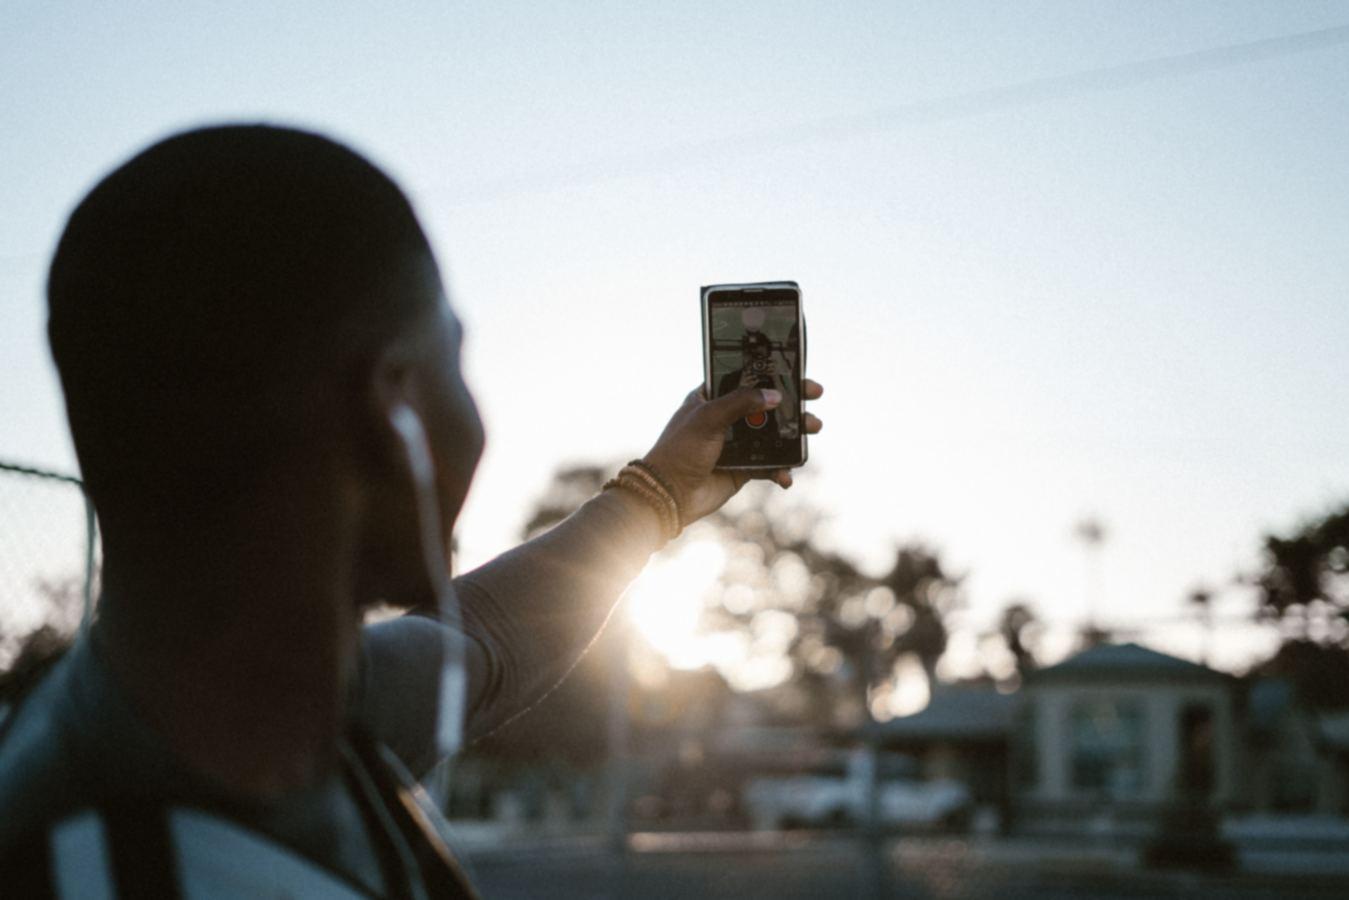 US Black Consumers as Digital Users